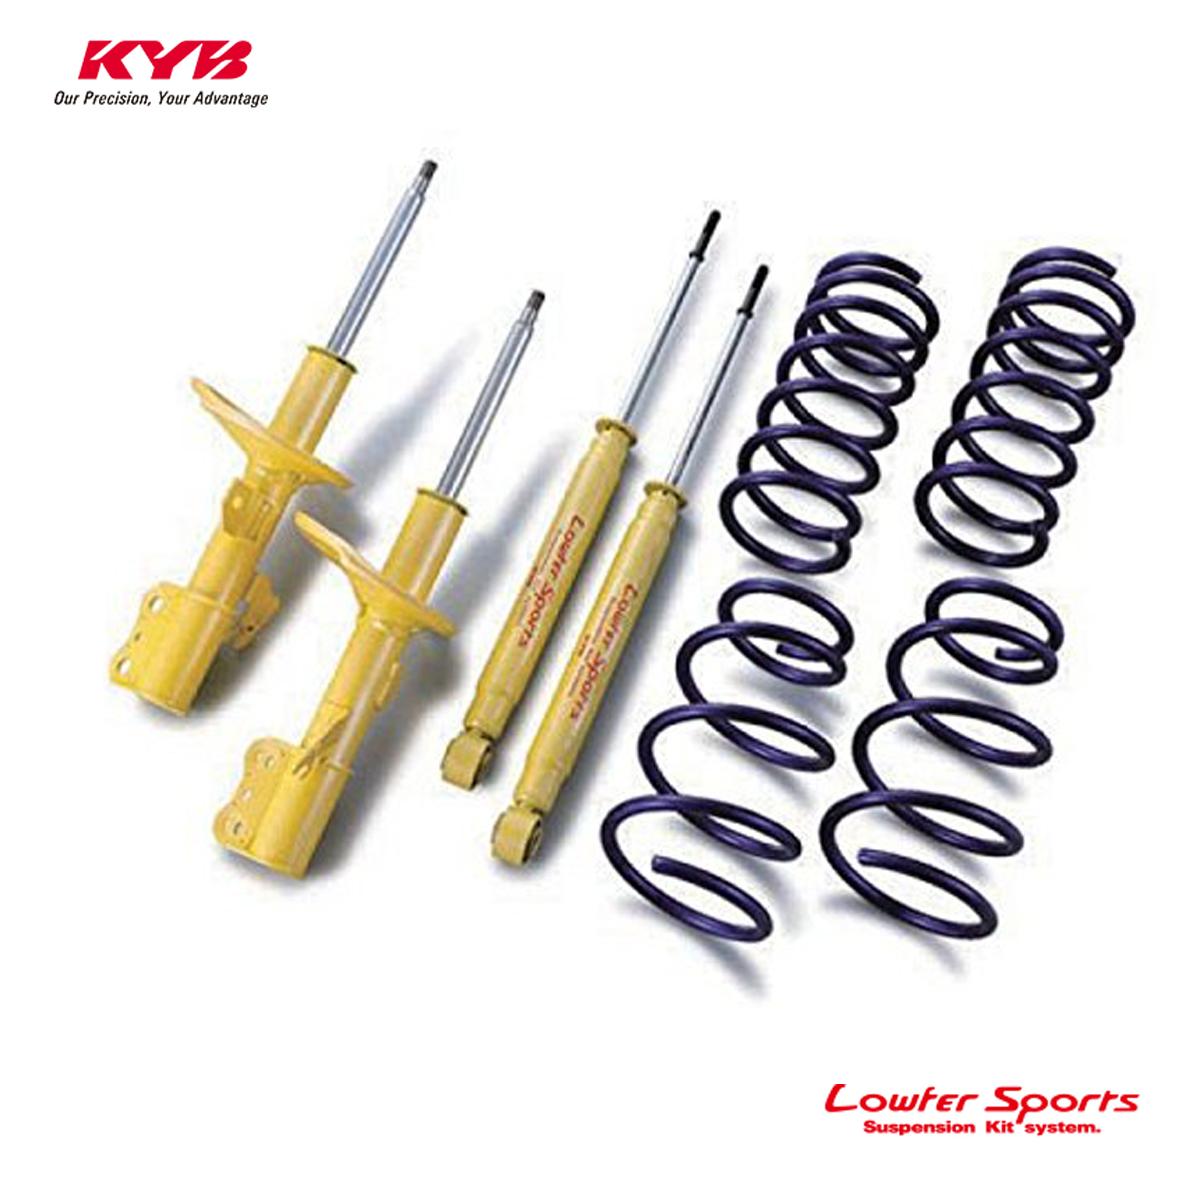 KYB カヤバ SM-X RH2 ショックアブソーバー サスペンションキット Lowfer Sports LKIT-RH1 配送先条件有り